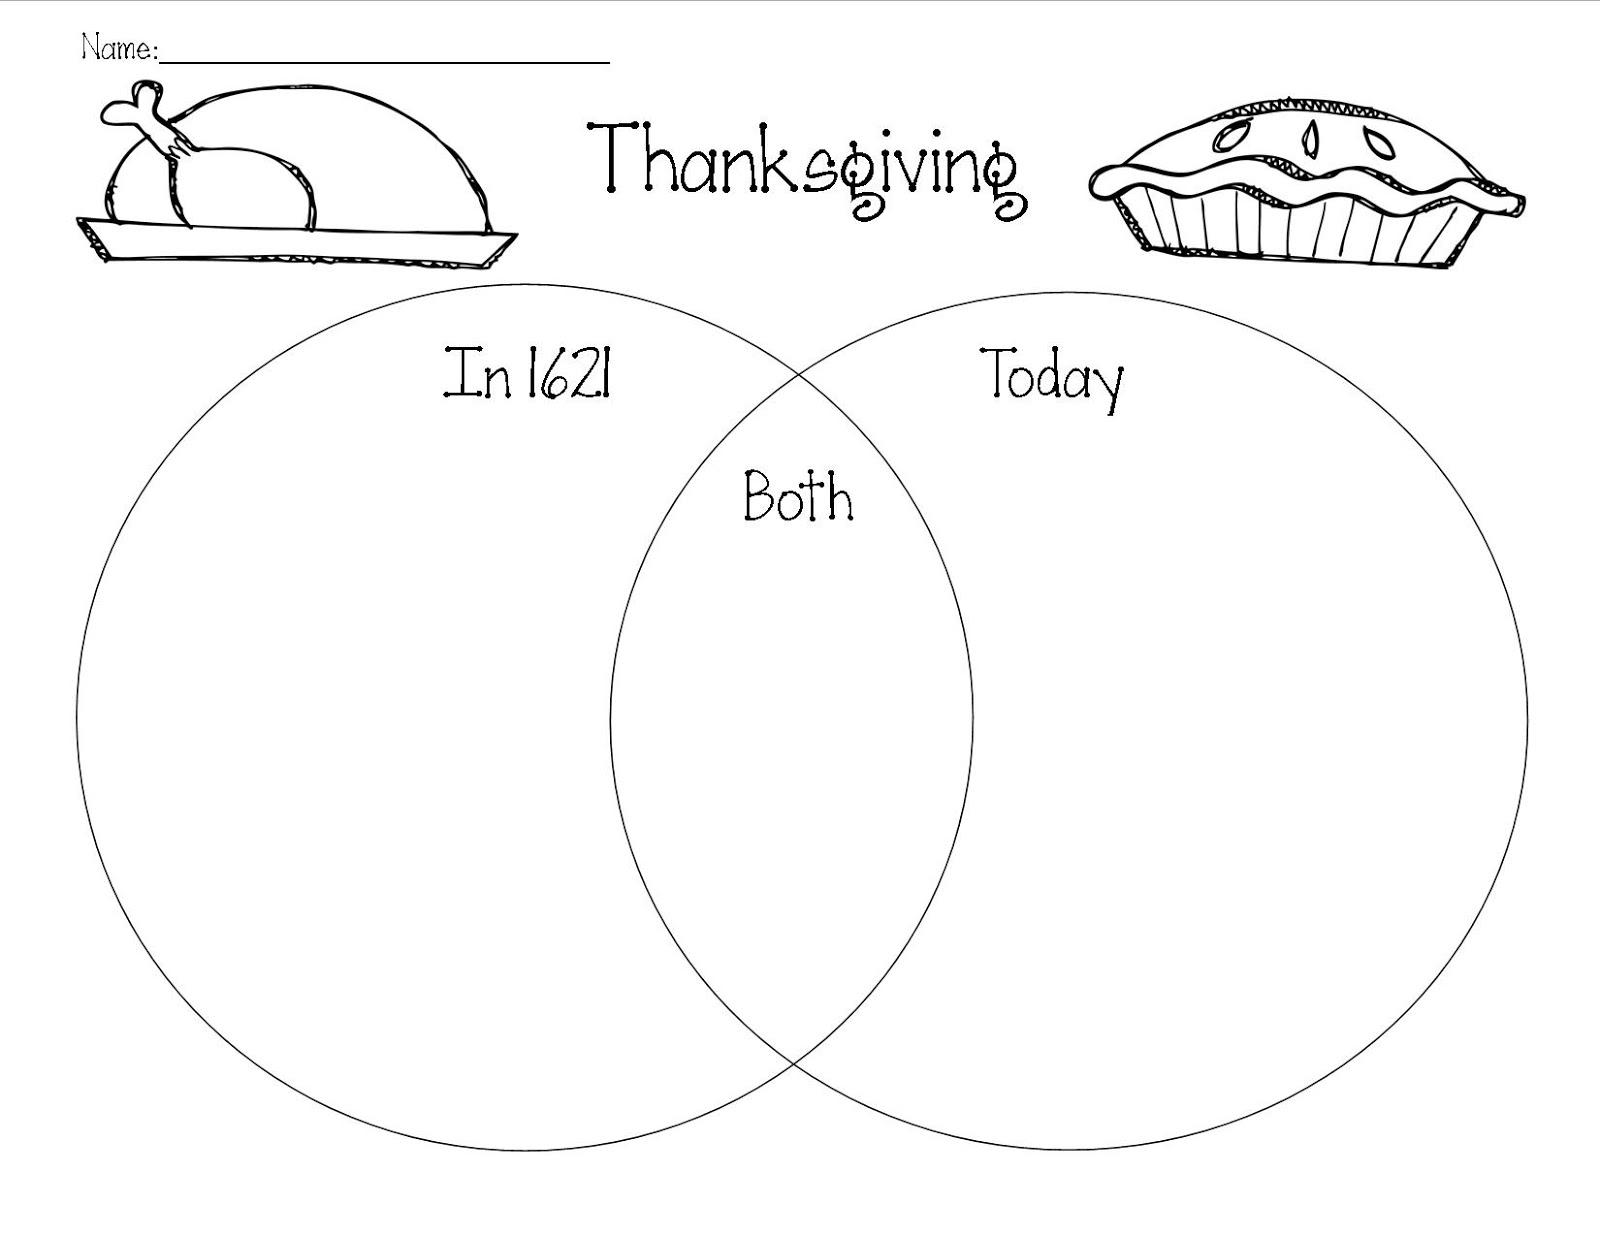 medium resolution of teacher and a mom thanksgiving compare and contrast 1st grade venn diagram thanksgiving venn diagram cut and paste